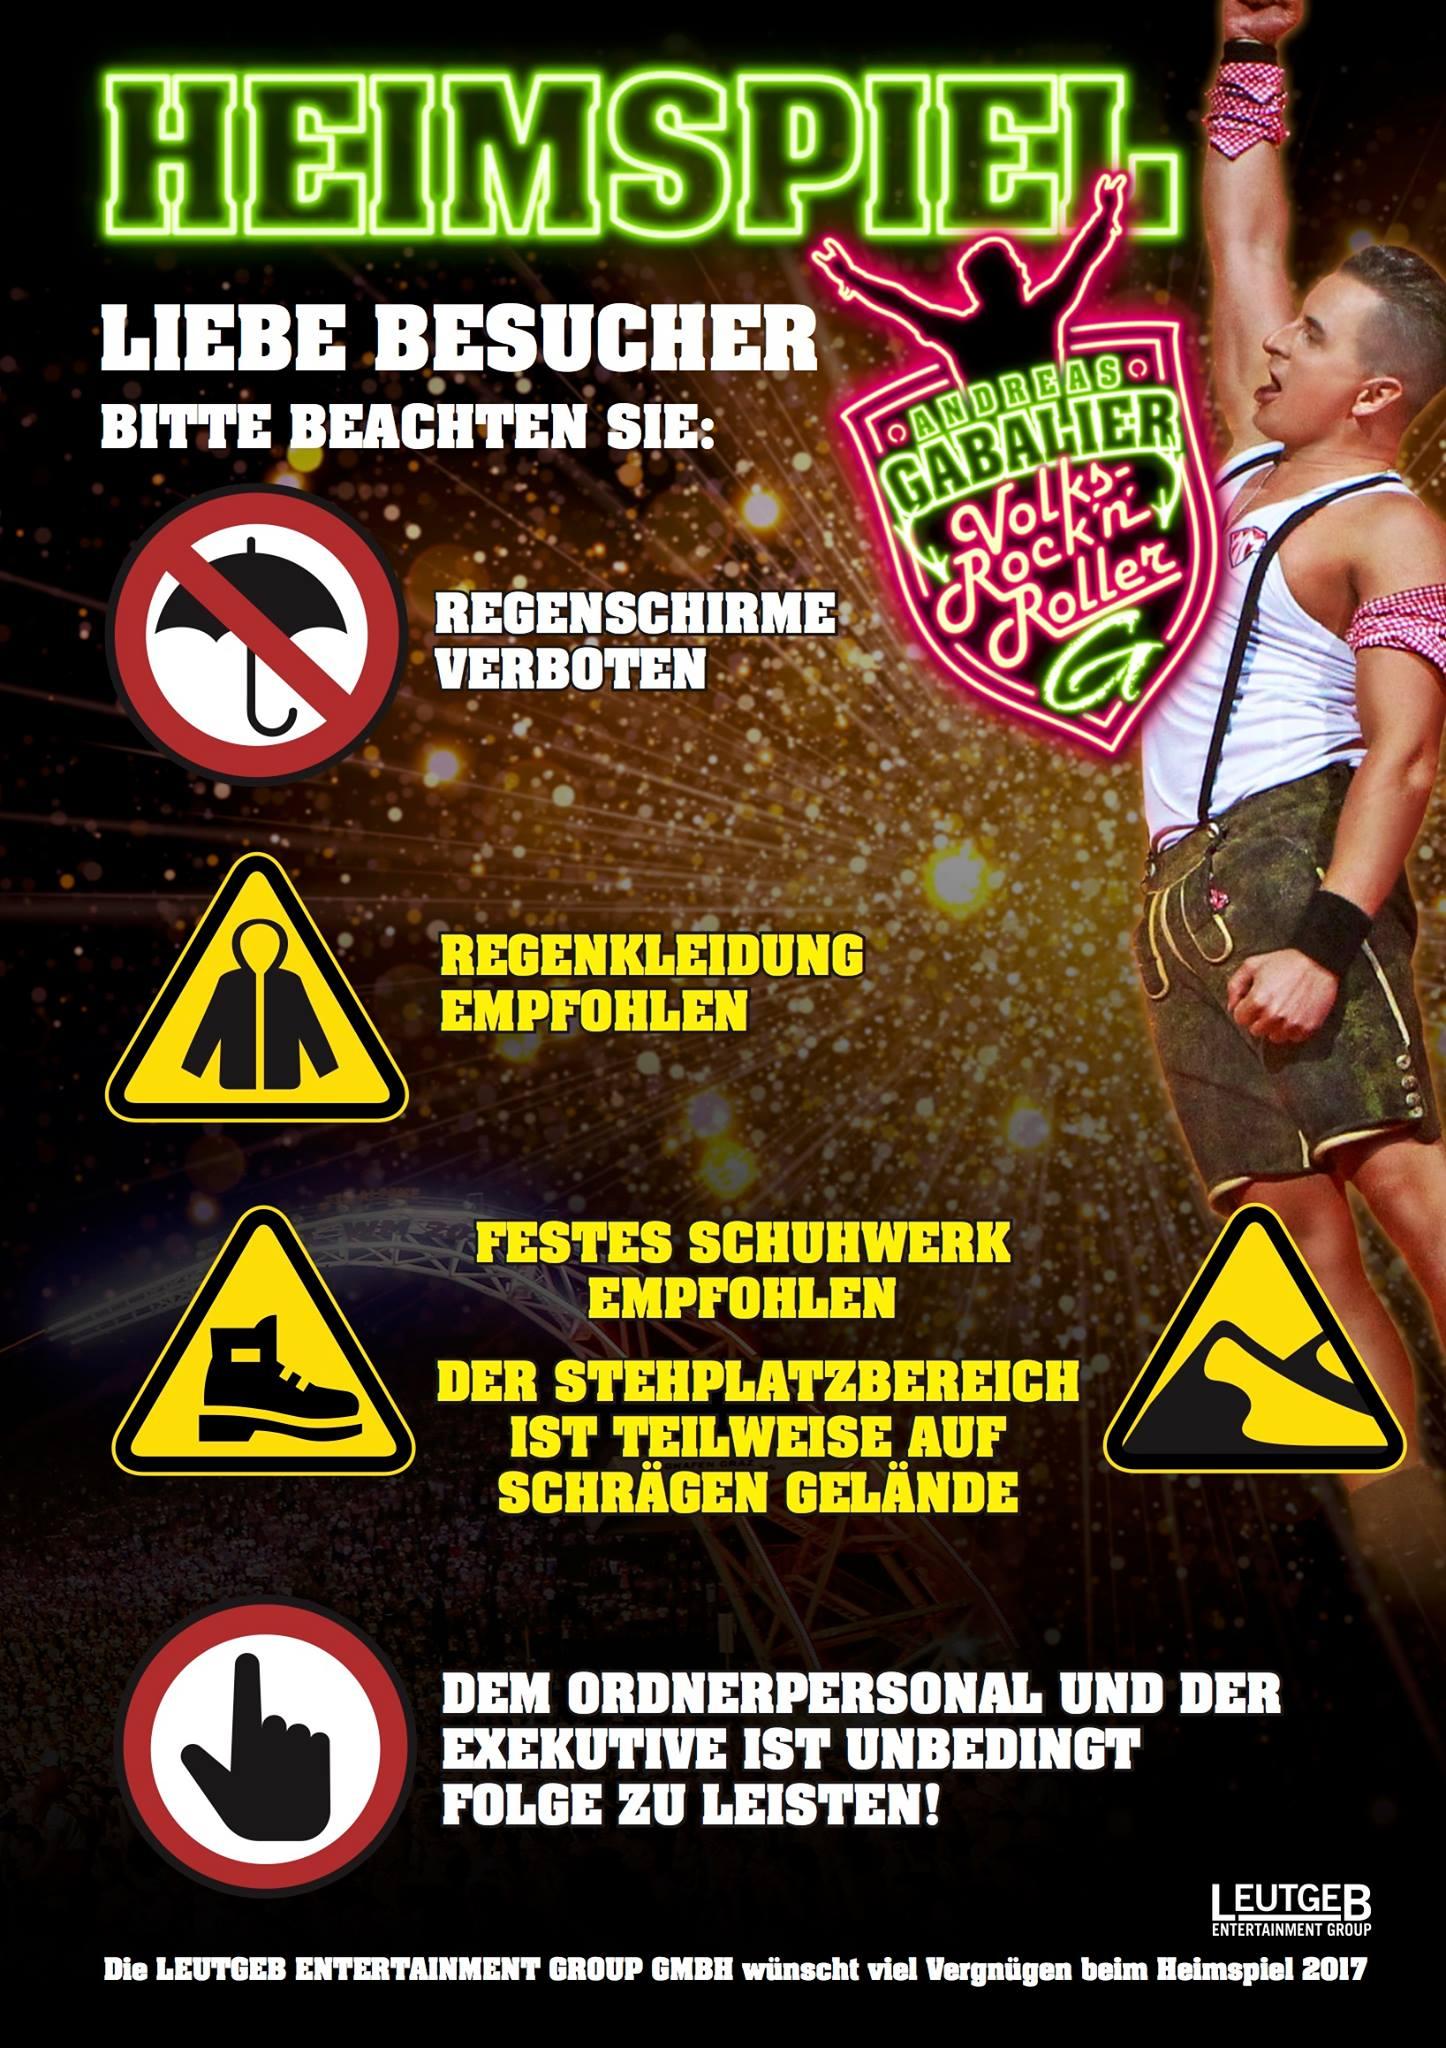 Verbotene Gegenstände Andreas Gabalier Heimspiel 2017 in Schladming